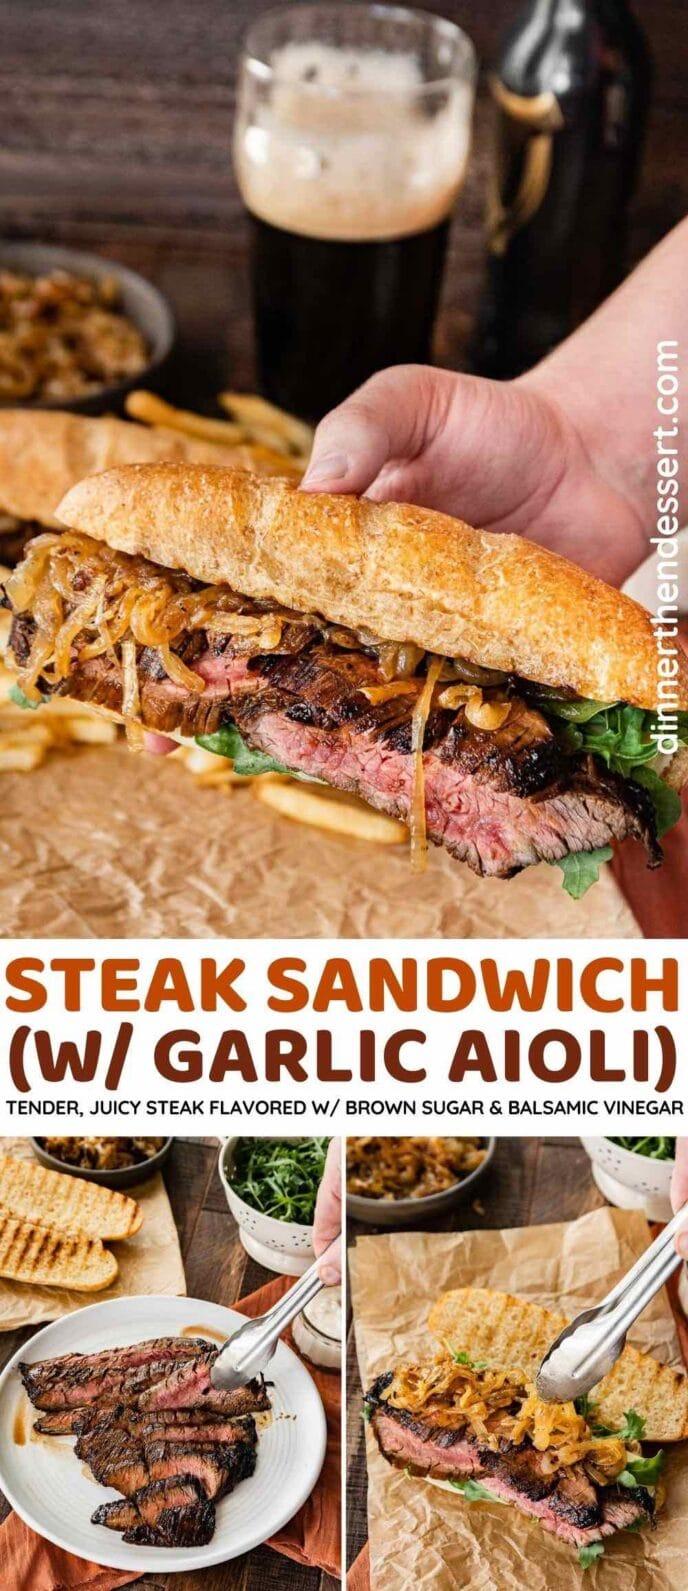 Steak Sandwich w/ Garlic Aioli collage